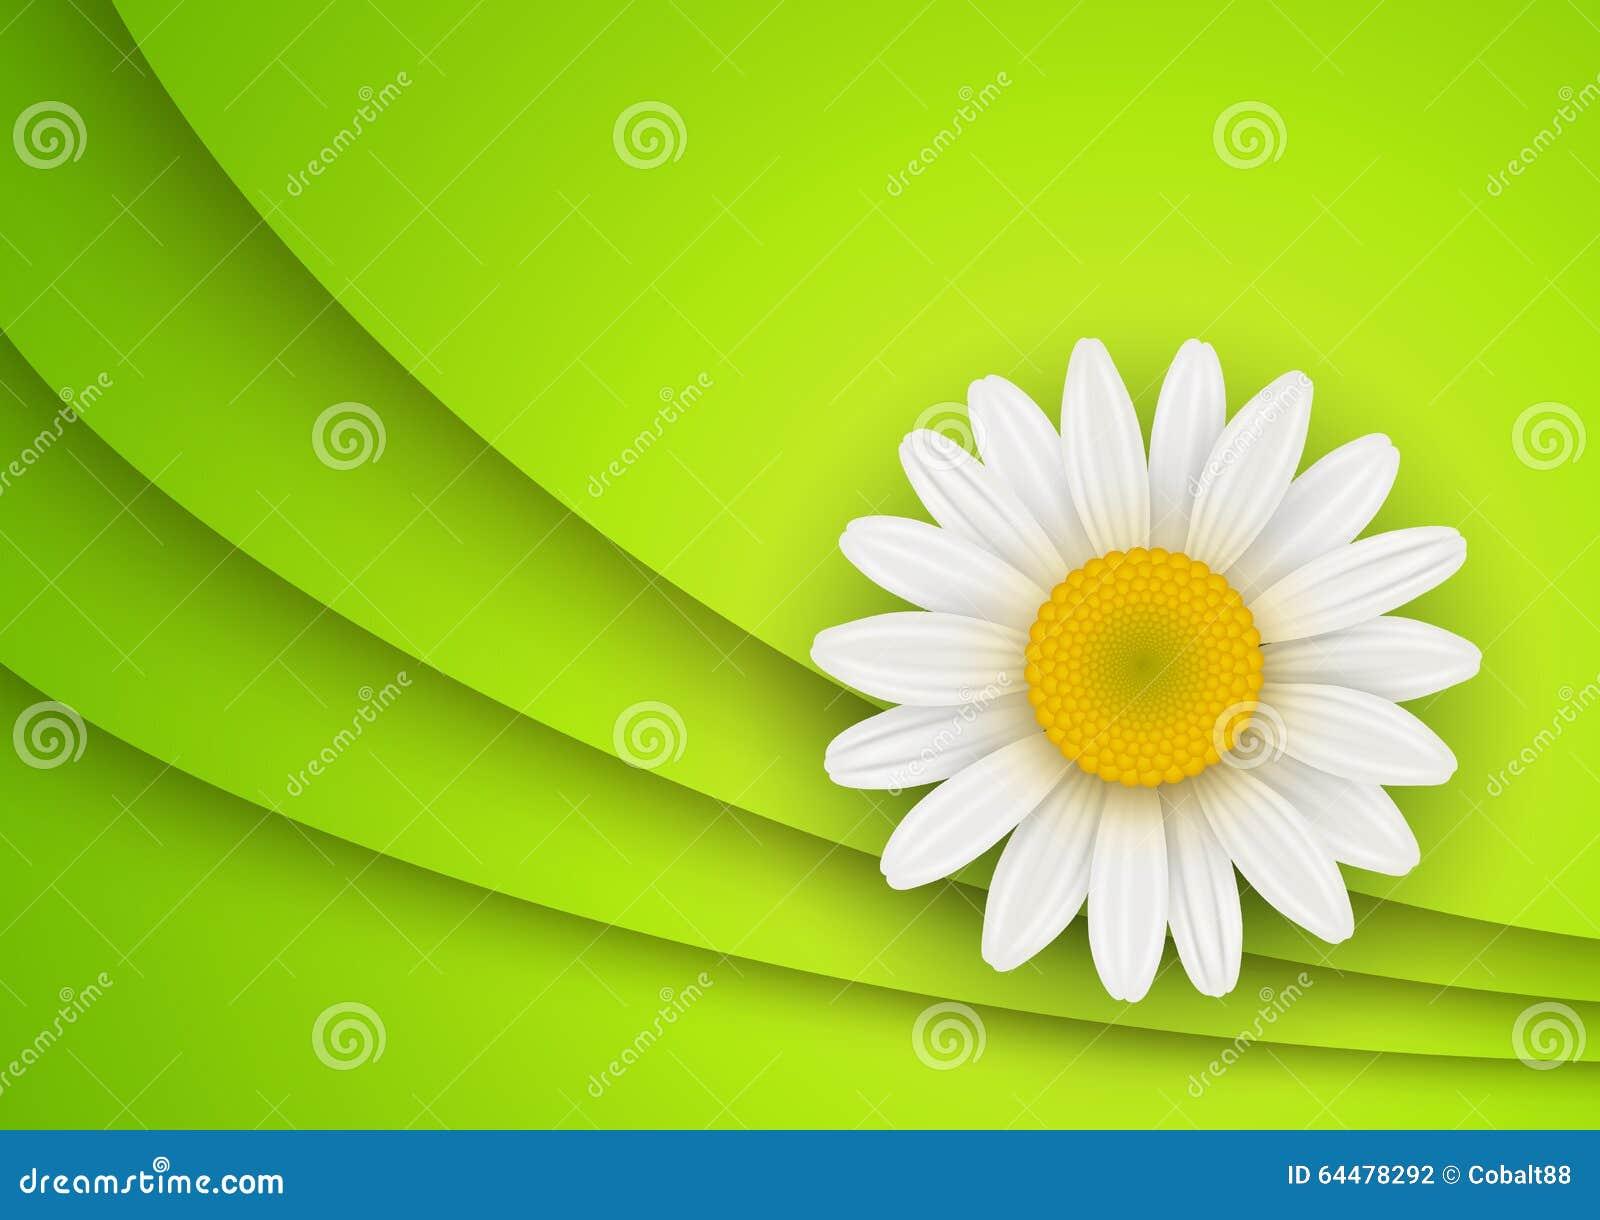 fond vert de fleur illustration de vecteur image 64478292. Black Bedroom Furniture Sets. Home Design Ideas